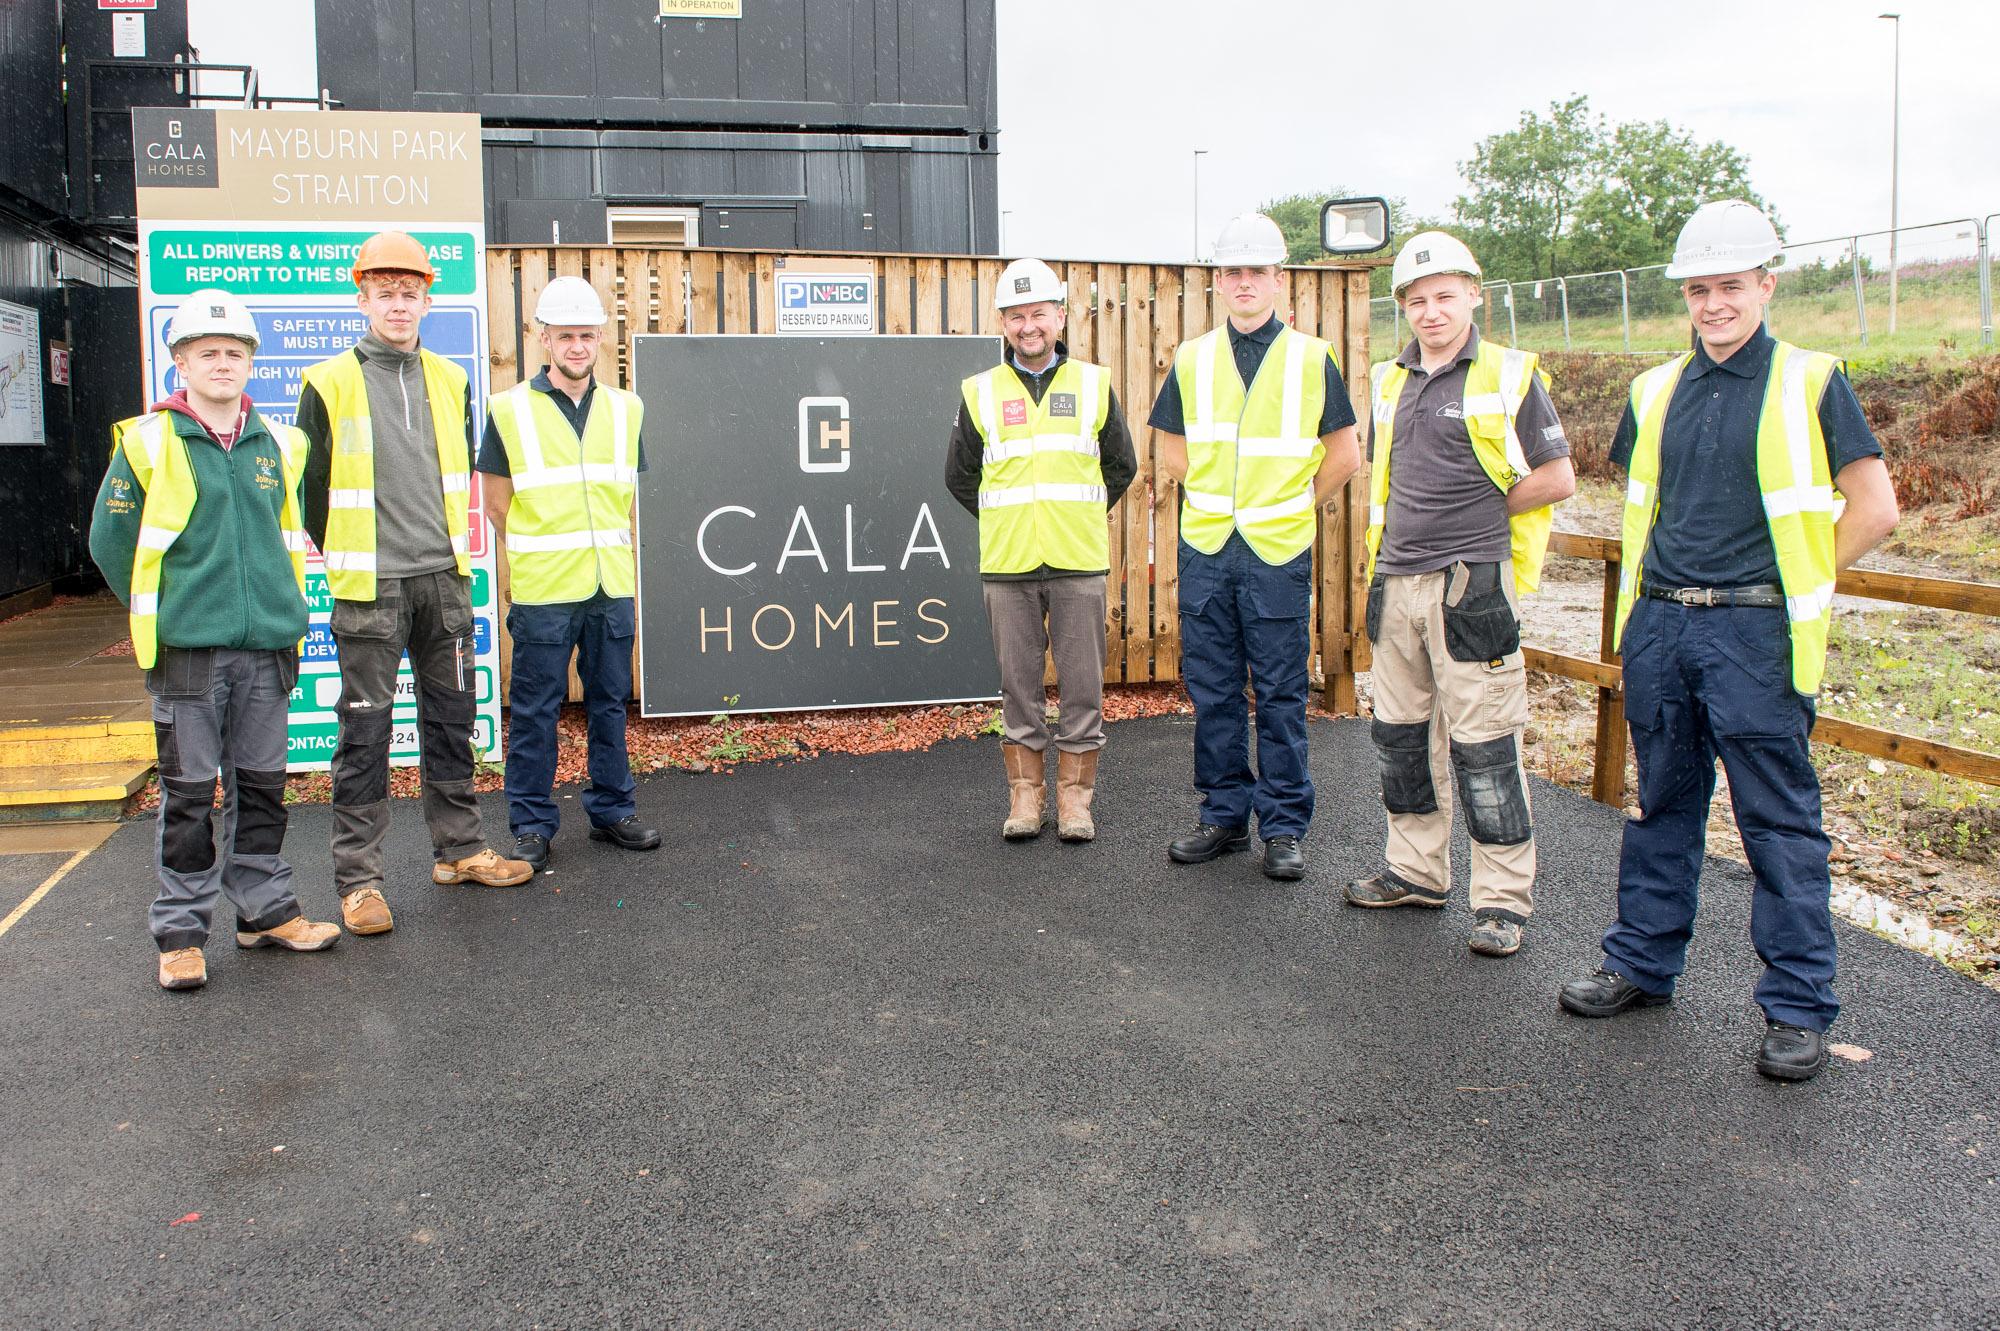 CALA's apprentices pose for Scottish PR Agency Story